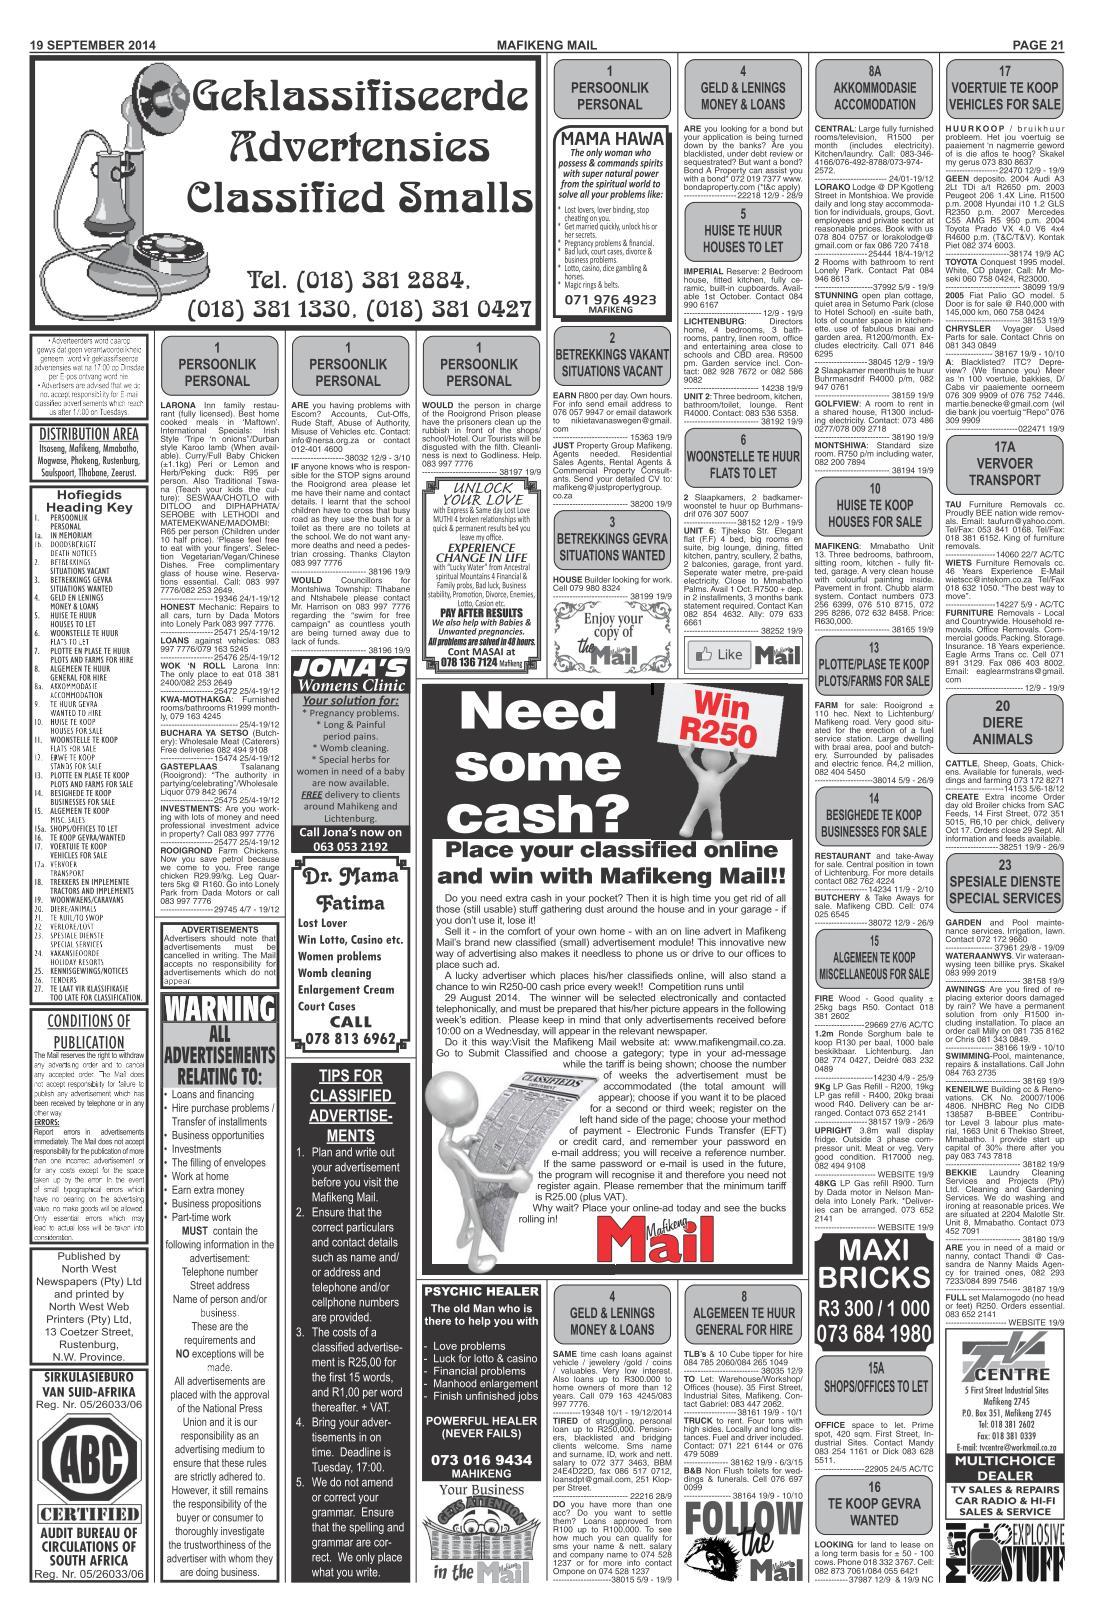 http://www.salocalnewspapers.co.za/newspapers/mafikengmail/previousnewspapers/2014/sep2014/19september2014_week38/mthema0211809.jpg